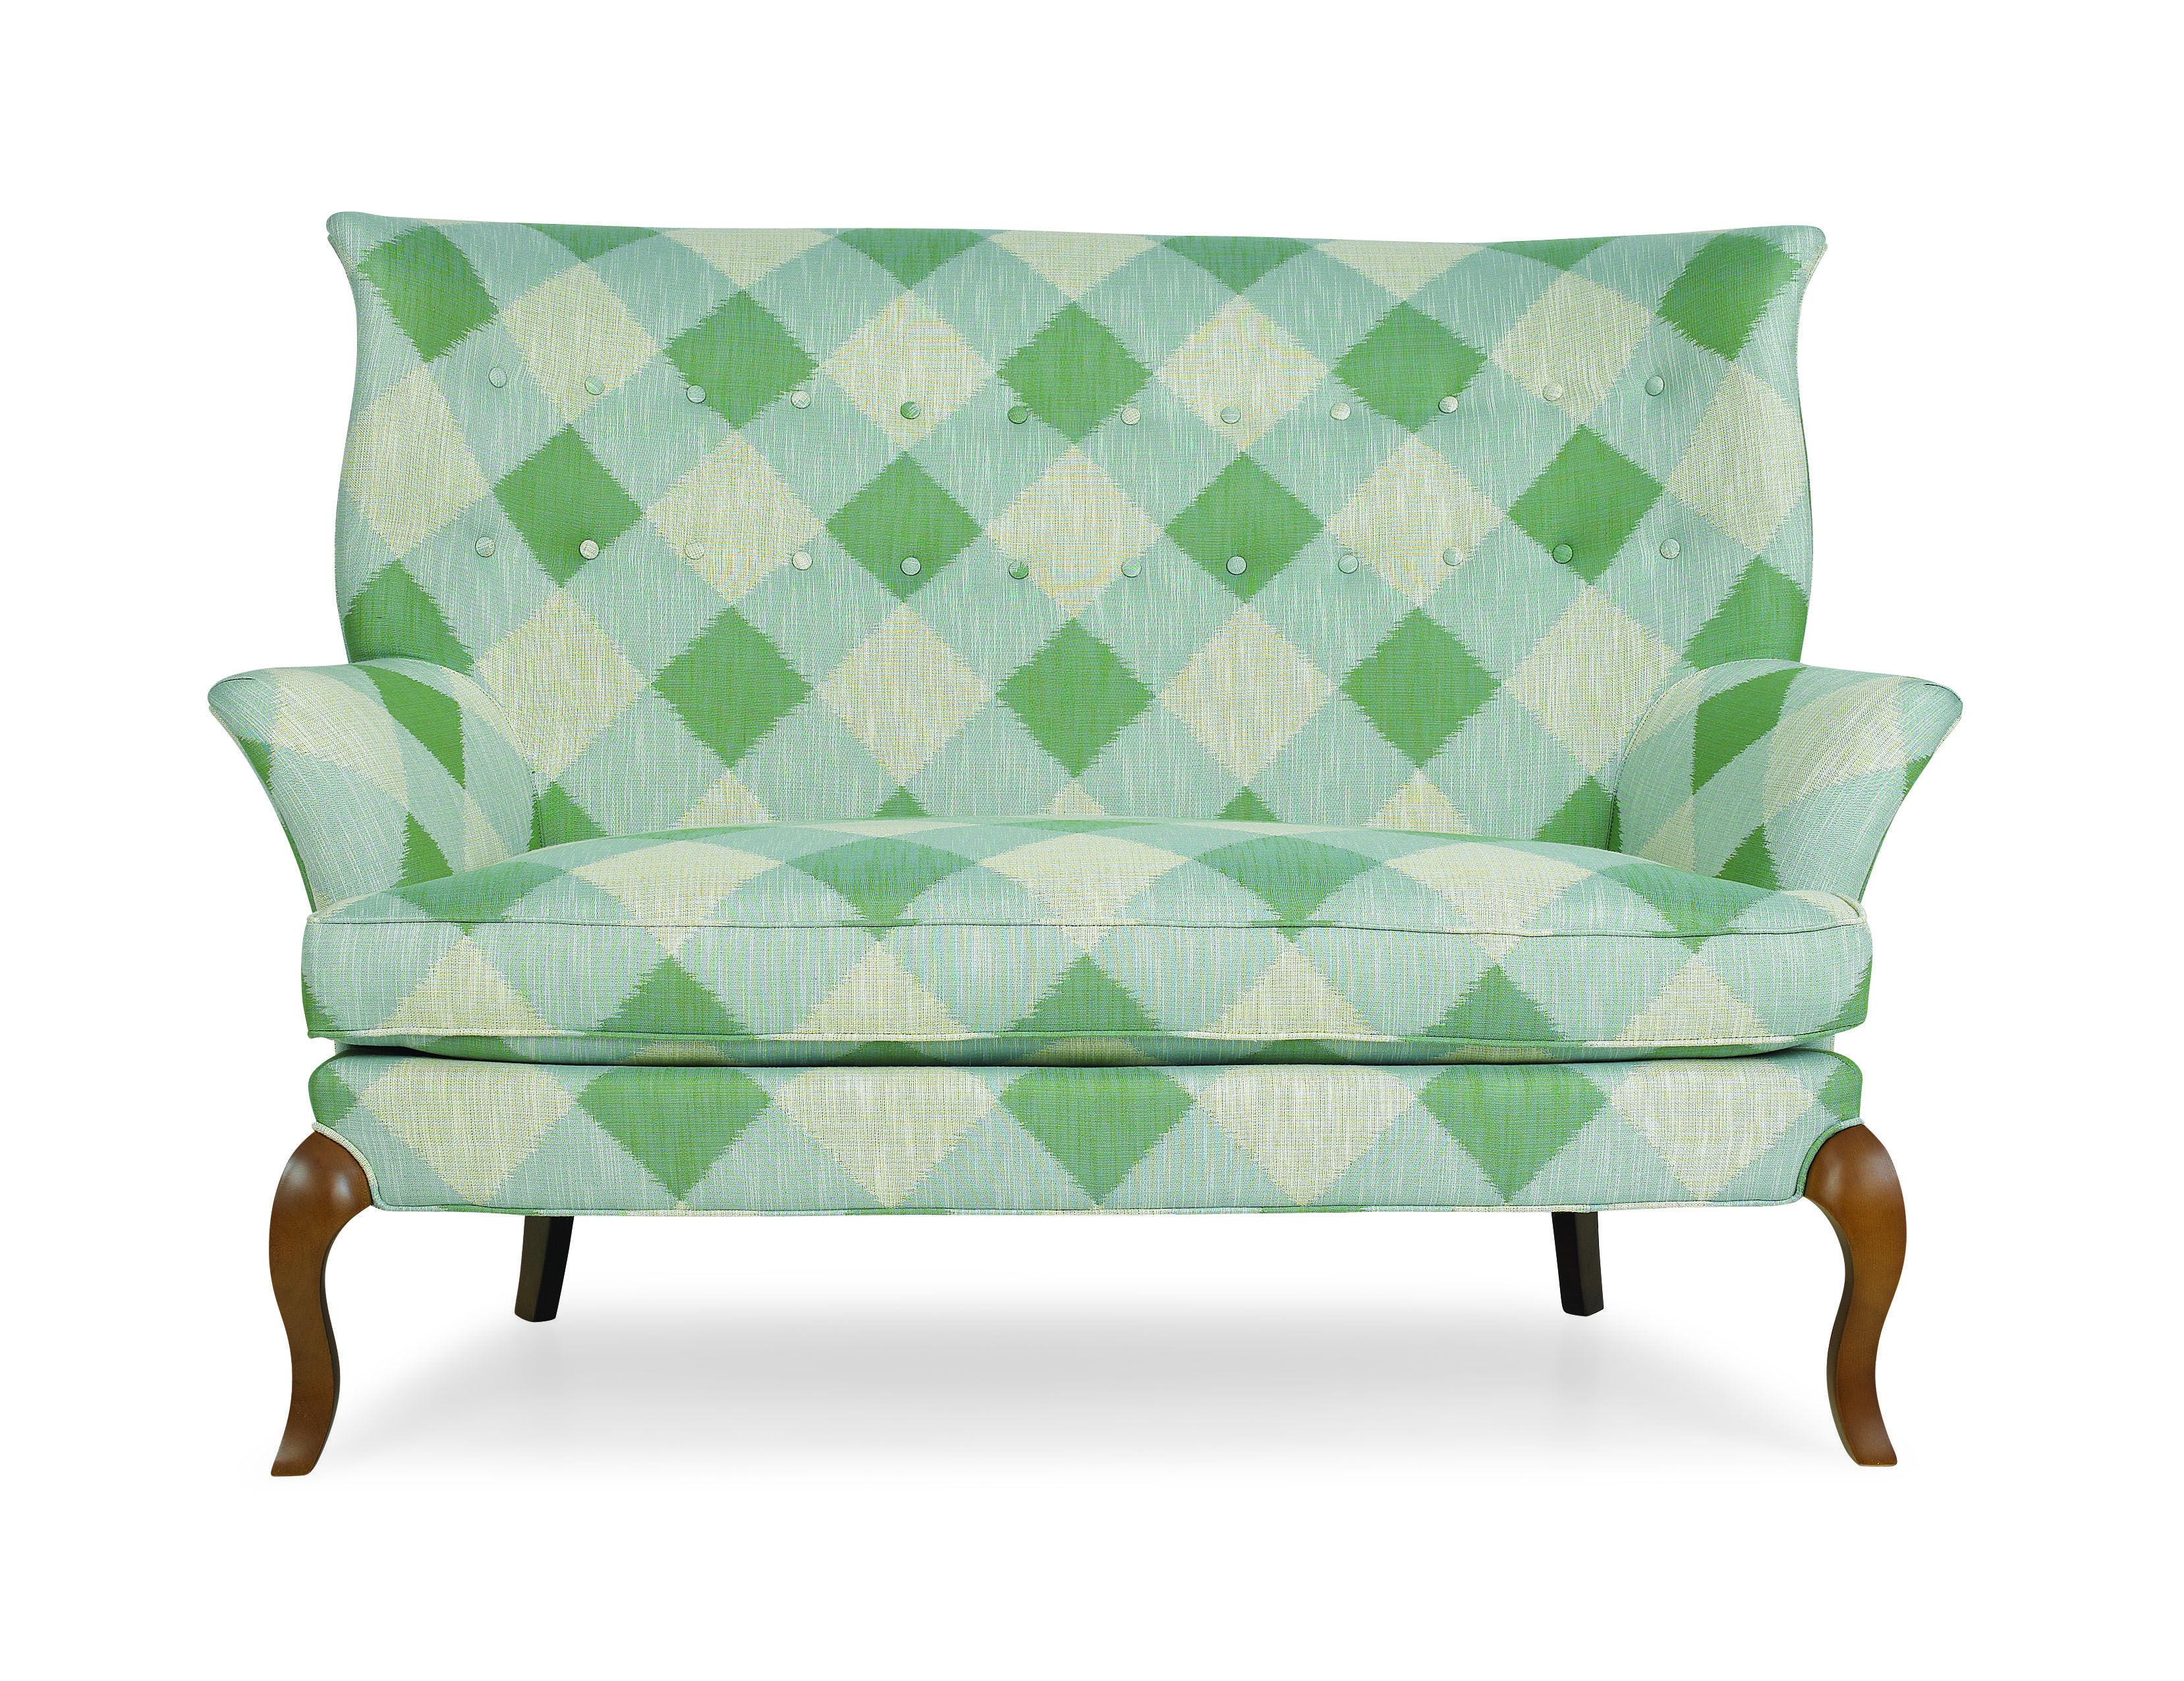 Green Plaid Sofa Crlaine Luxury Furniture Design Furniture